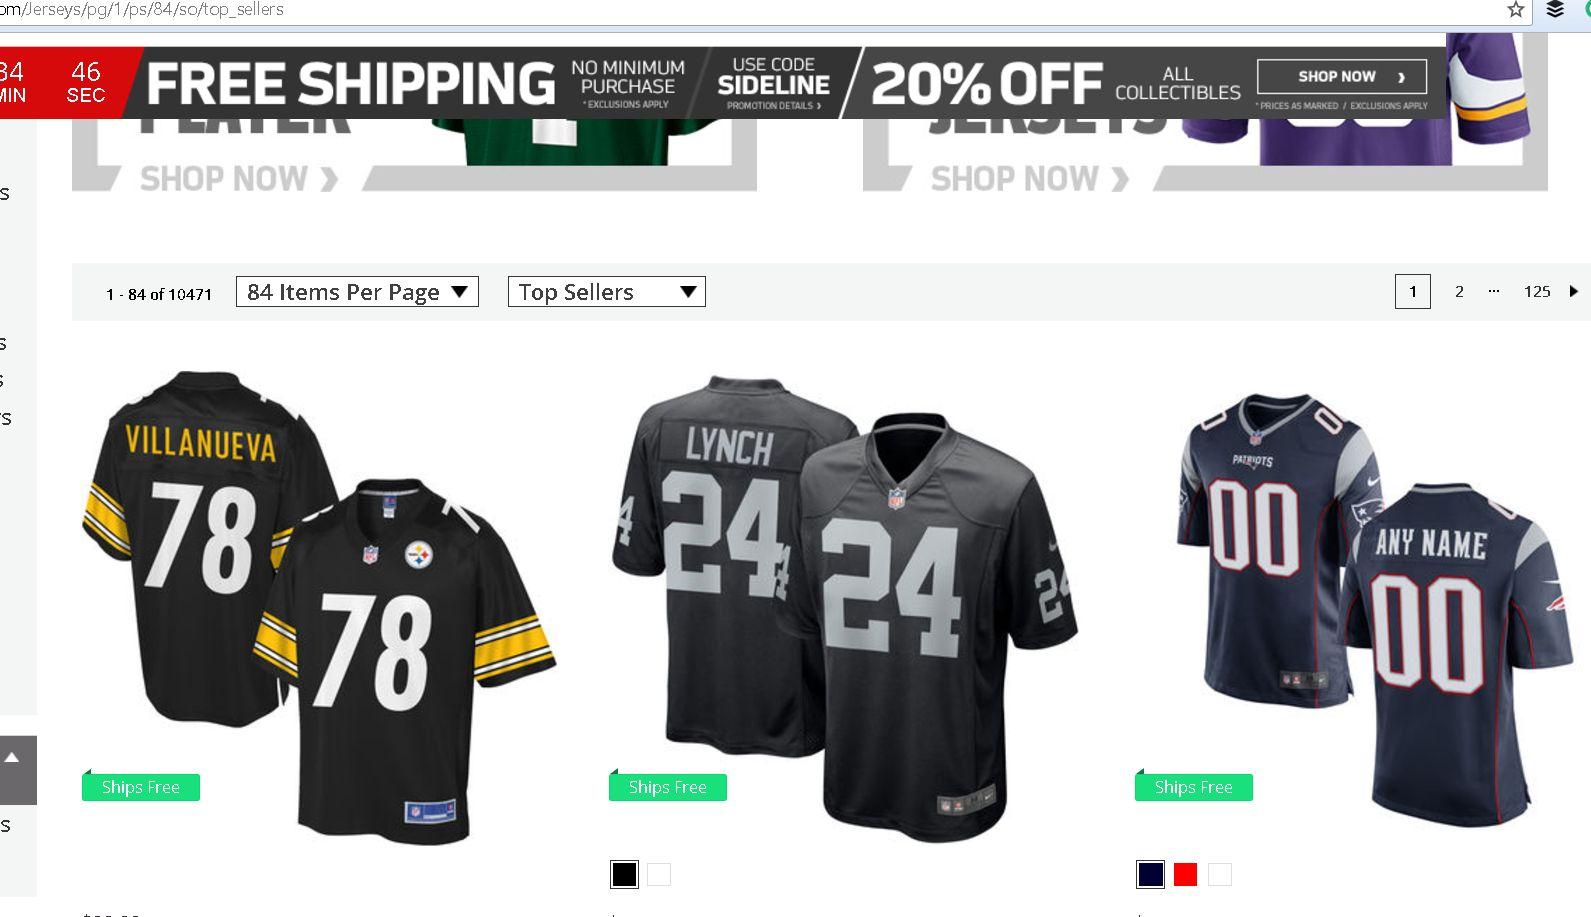 finest selection 424fd 7aaf7 Steelers' Alejandro Villanueva Has Top-Selling Jersey Since ...